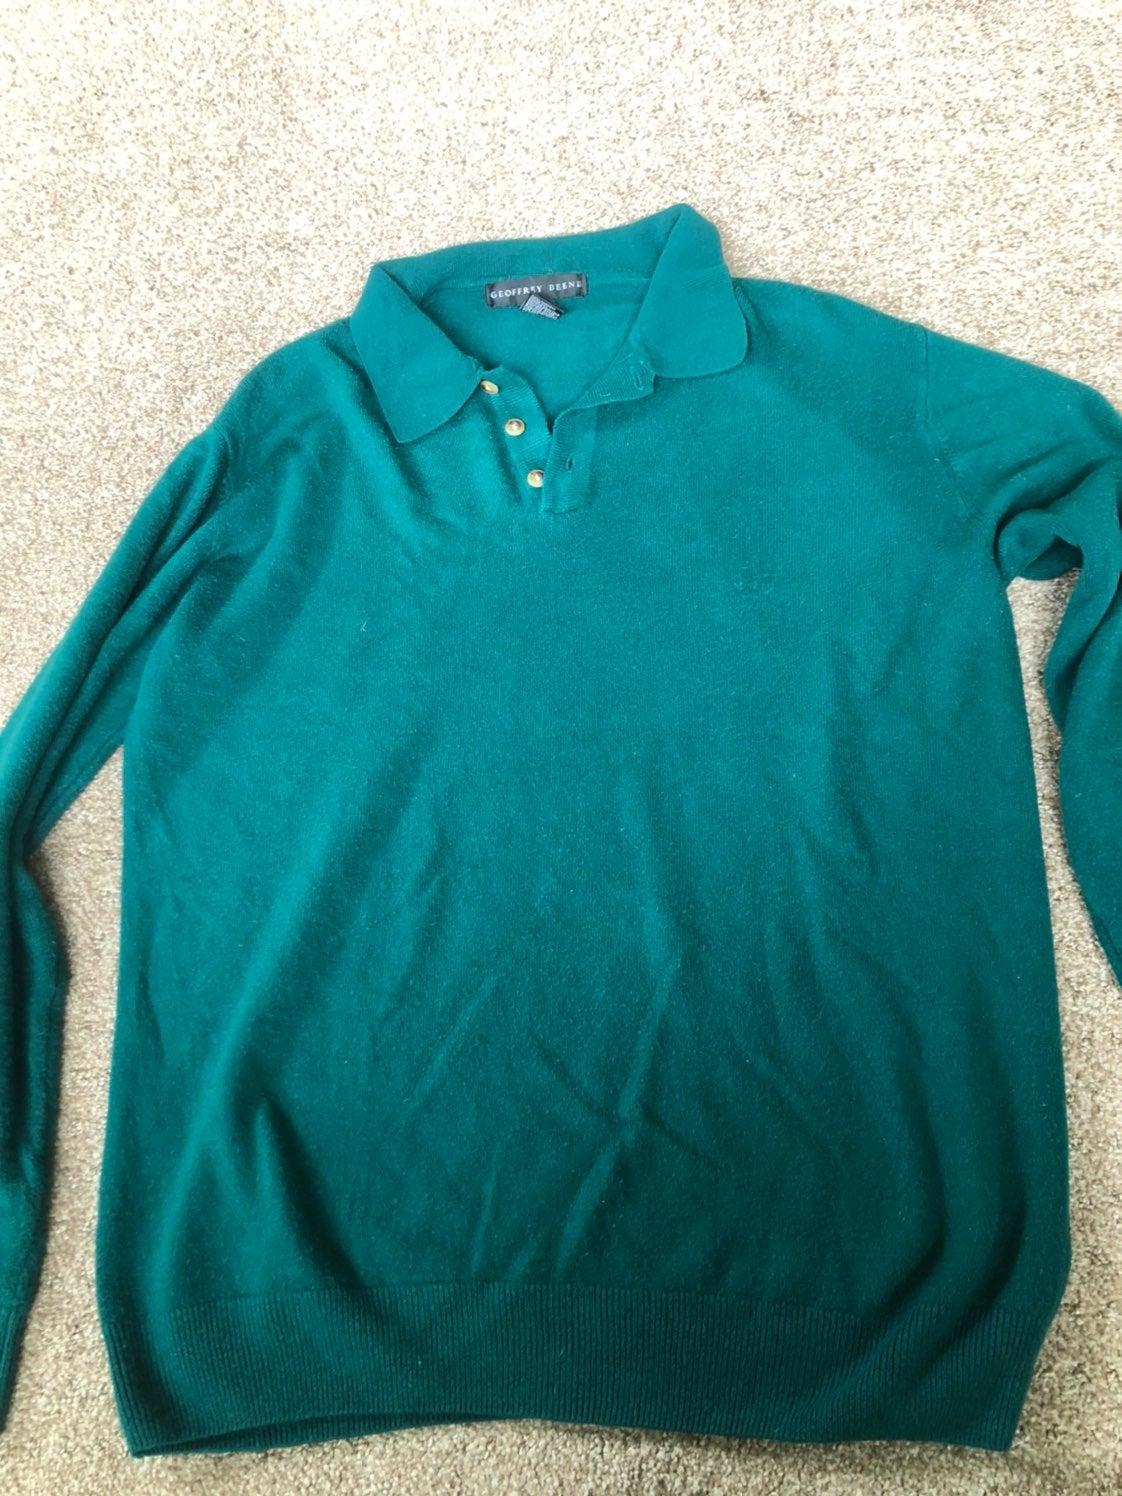 Mens button collar sweater